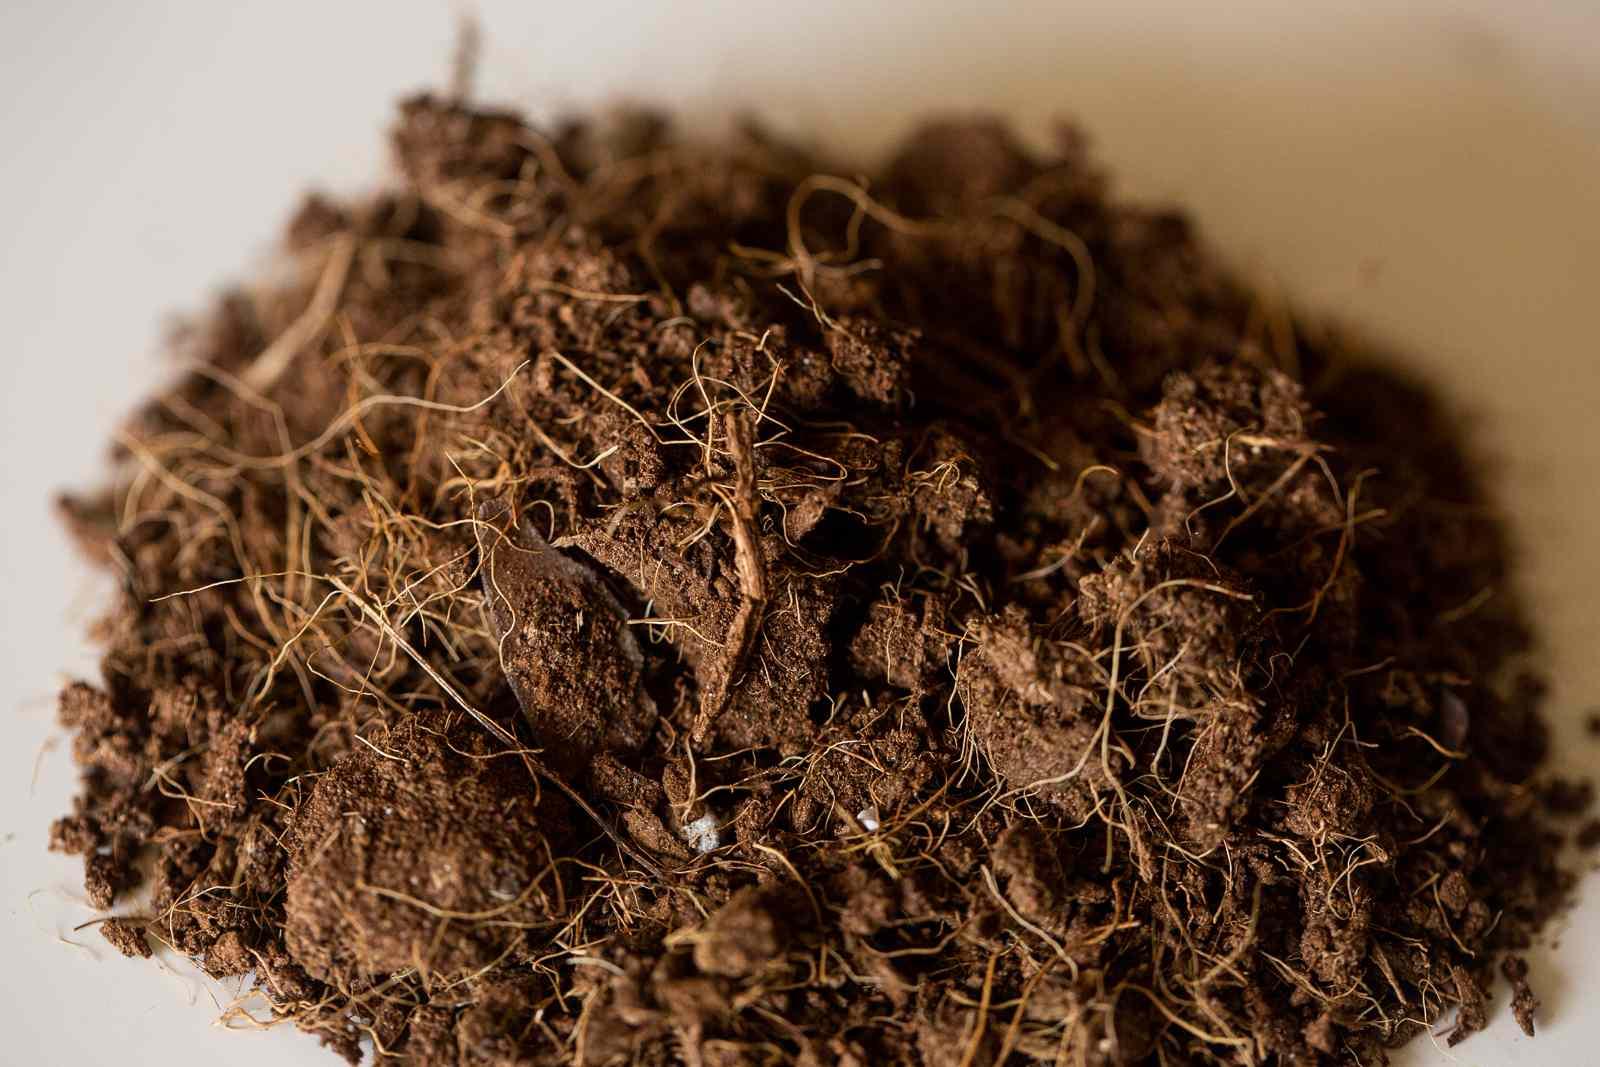 Pile of coconut coir fibers for soilless potting mix closeup